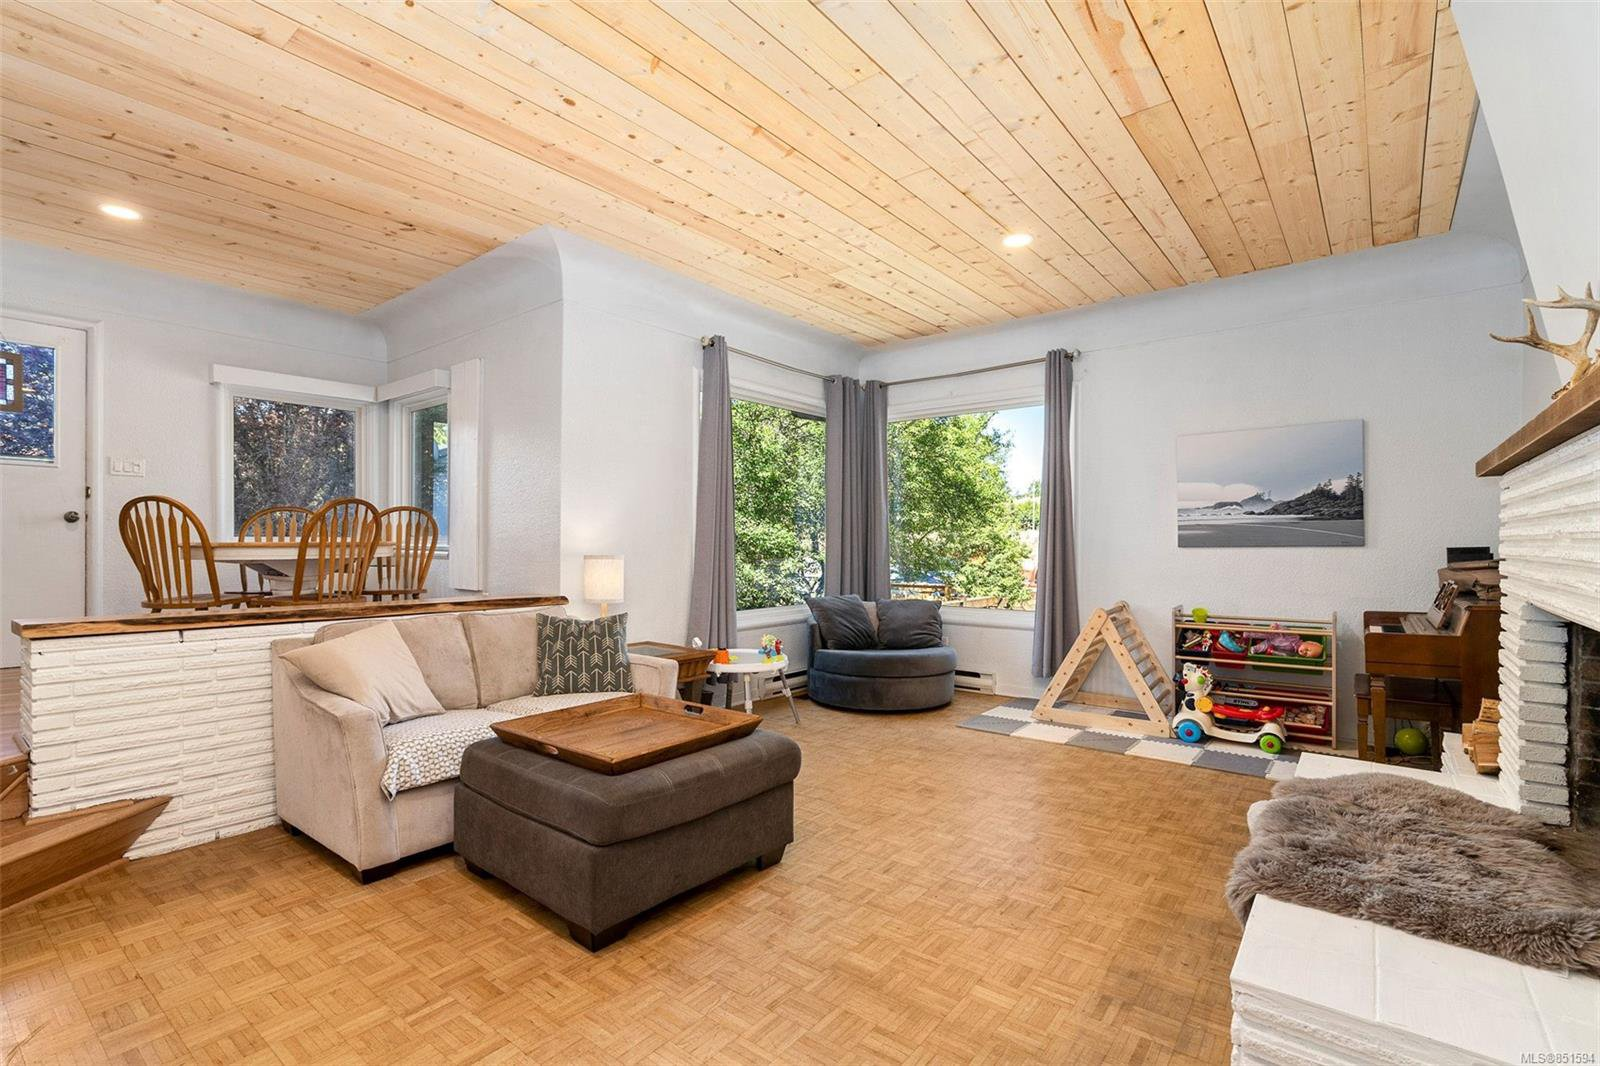 Main Photo: 1480 Finlayson Pl in : Vi Oaklands House for sale (Victoria)  : MLS®# 851594